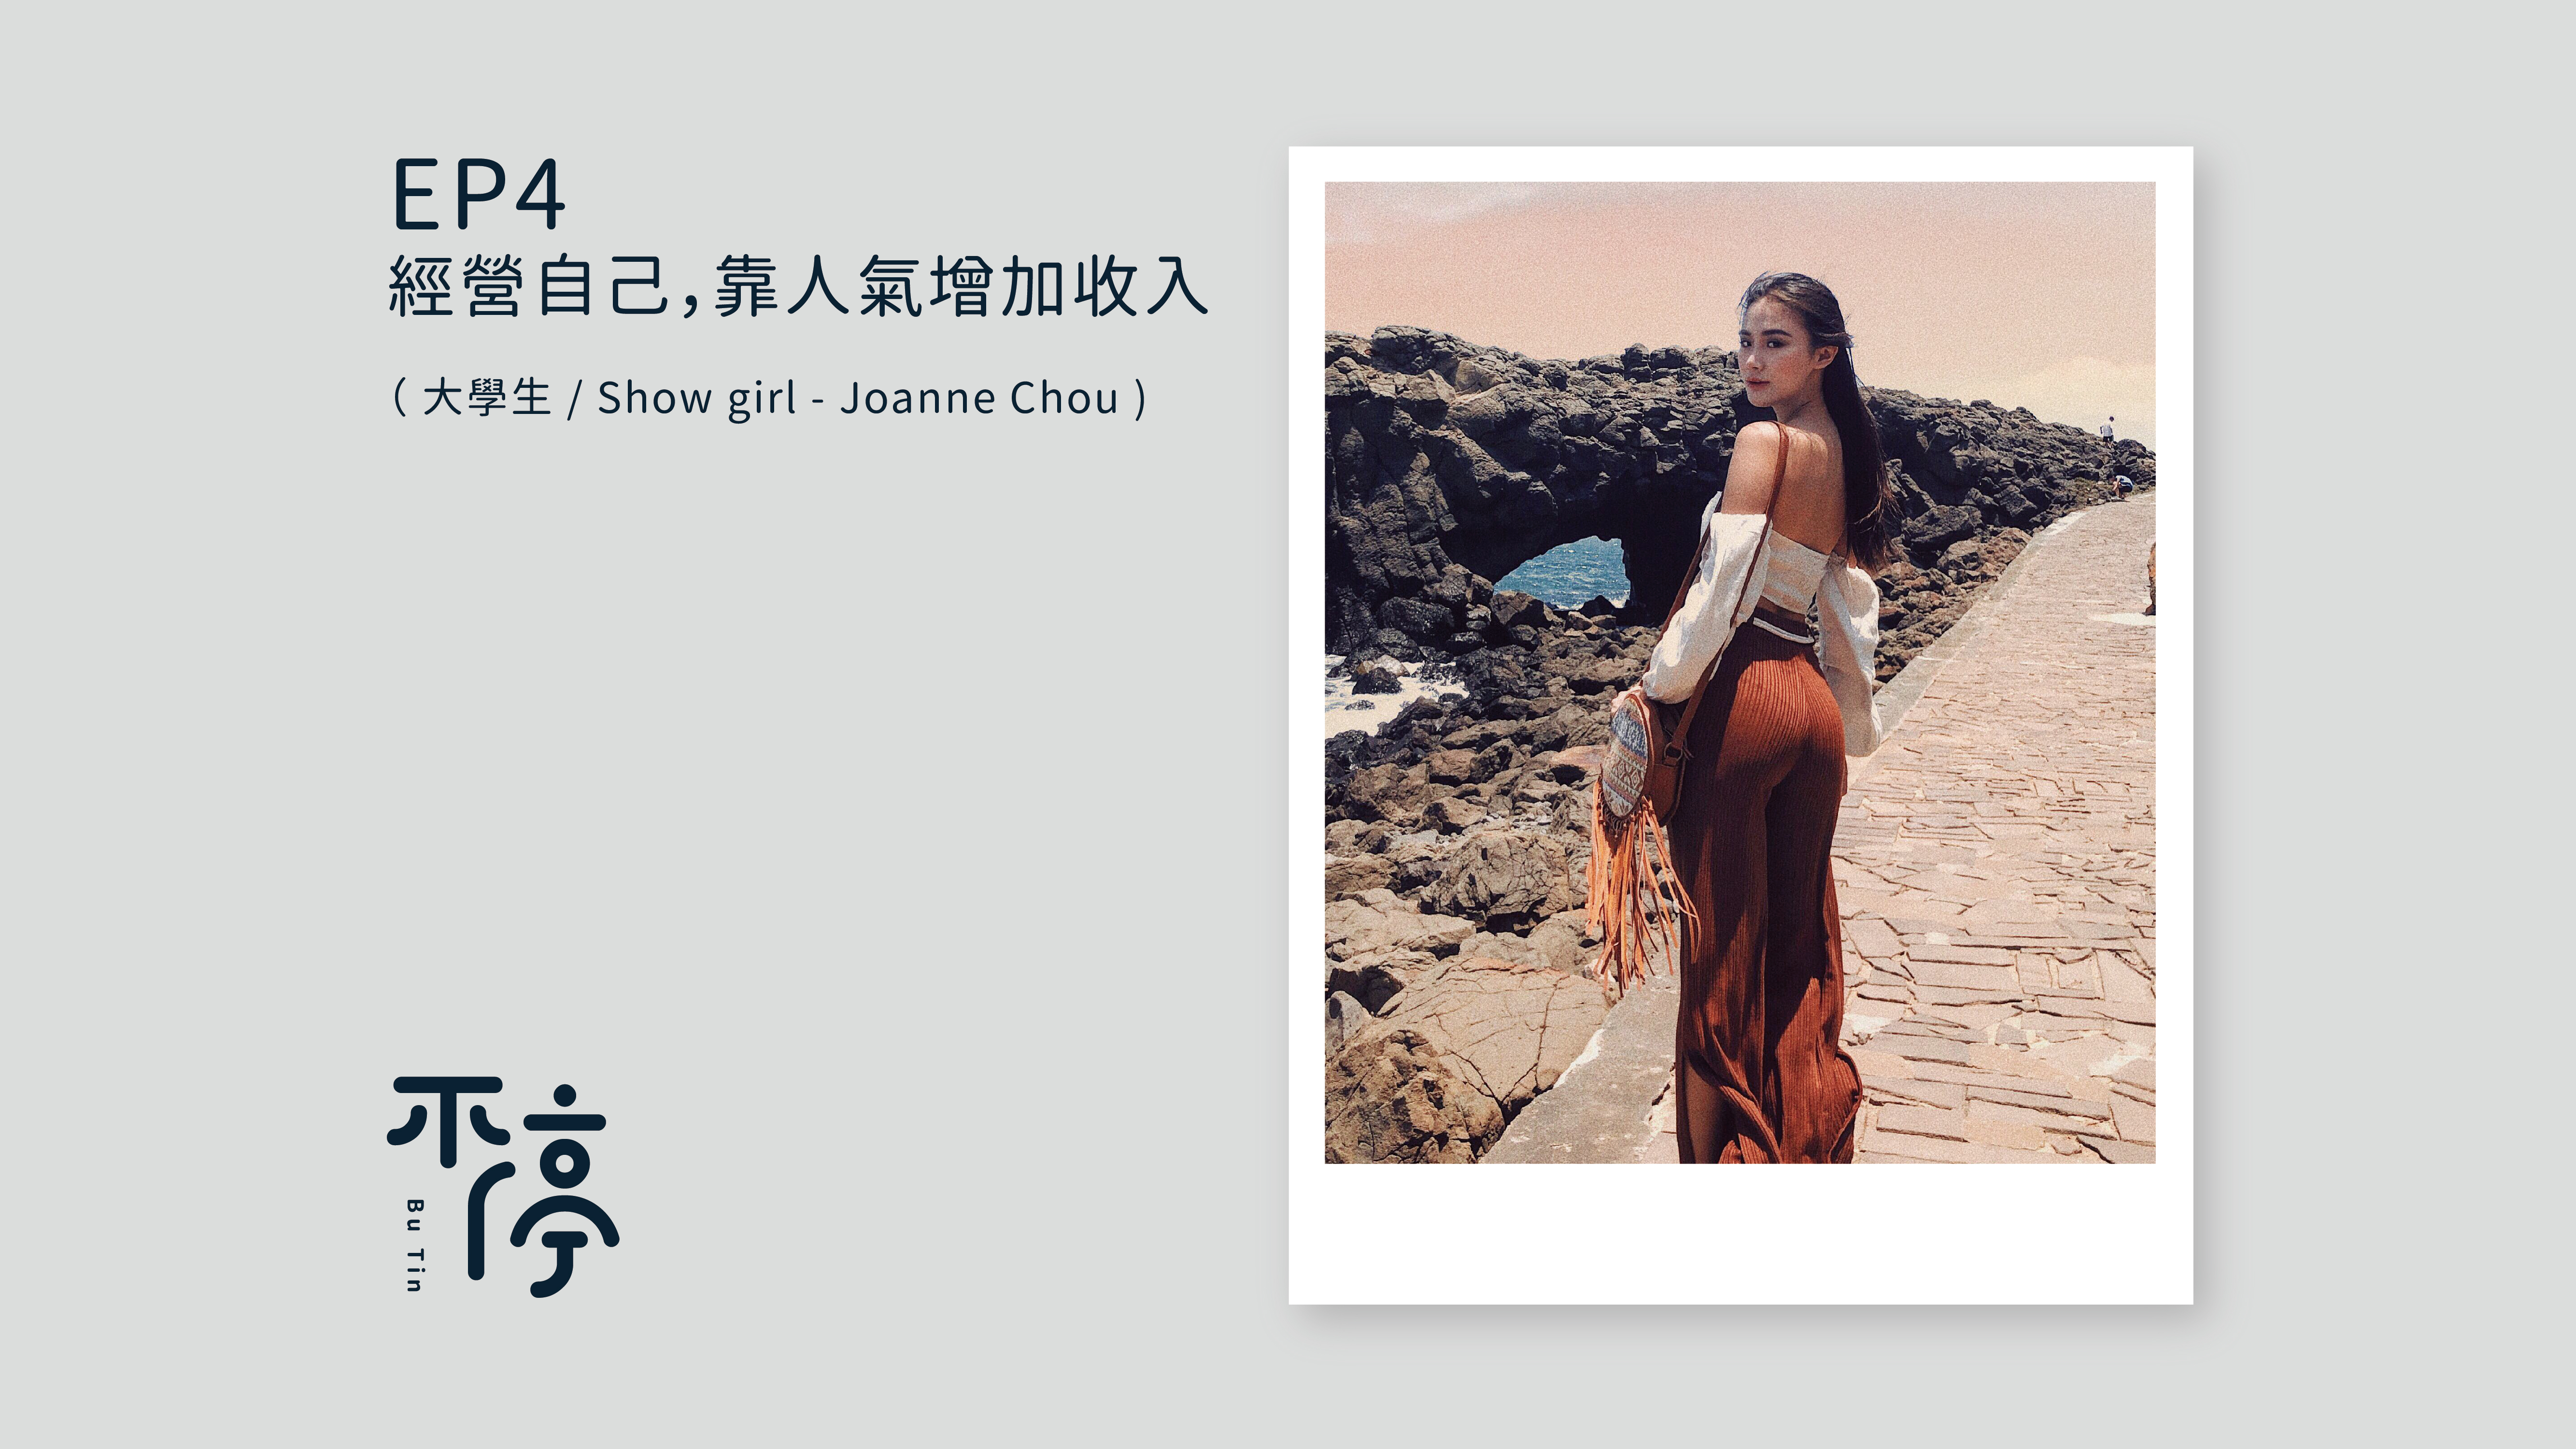 EP4 - 經營自己,靠人氣增加收入( 大學生 / Show girl - Joanne Chou )